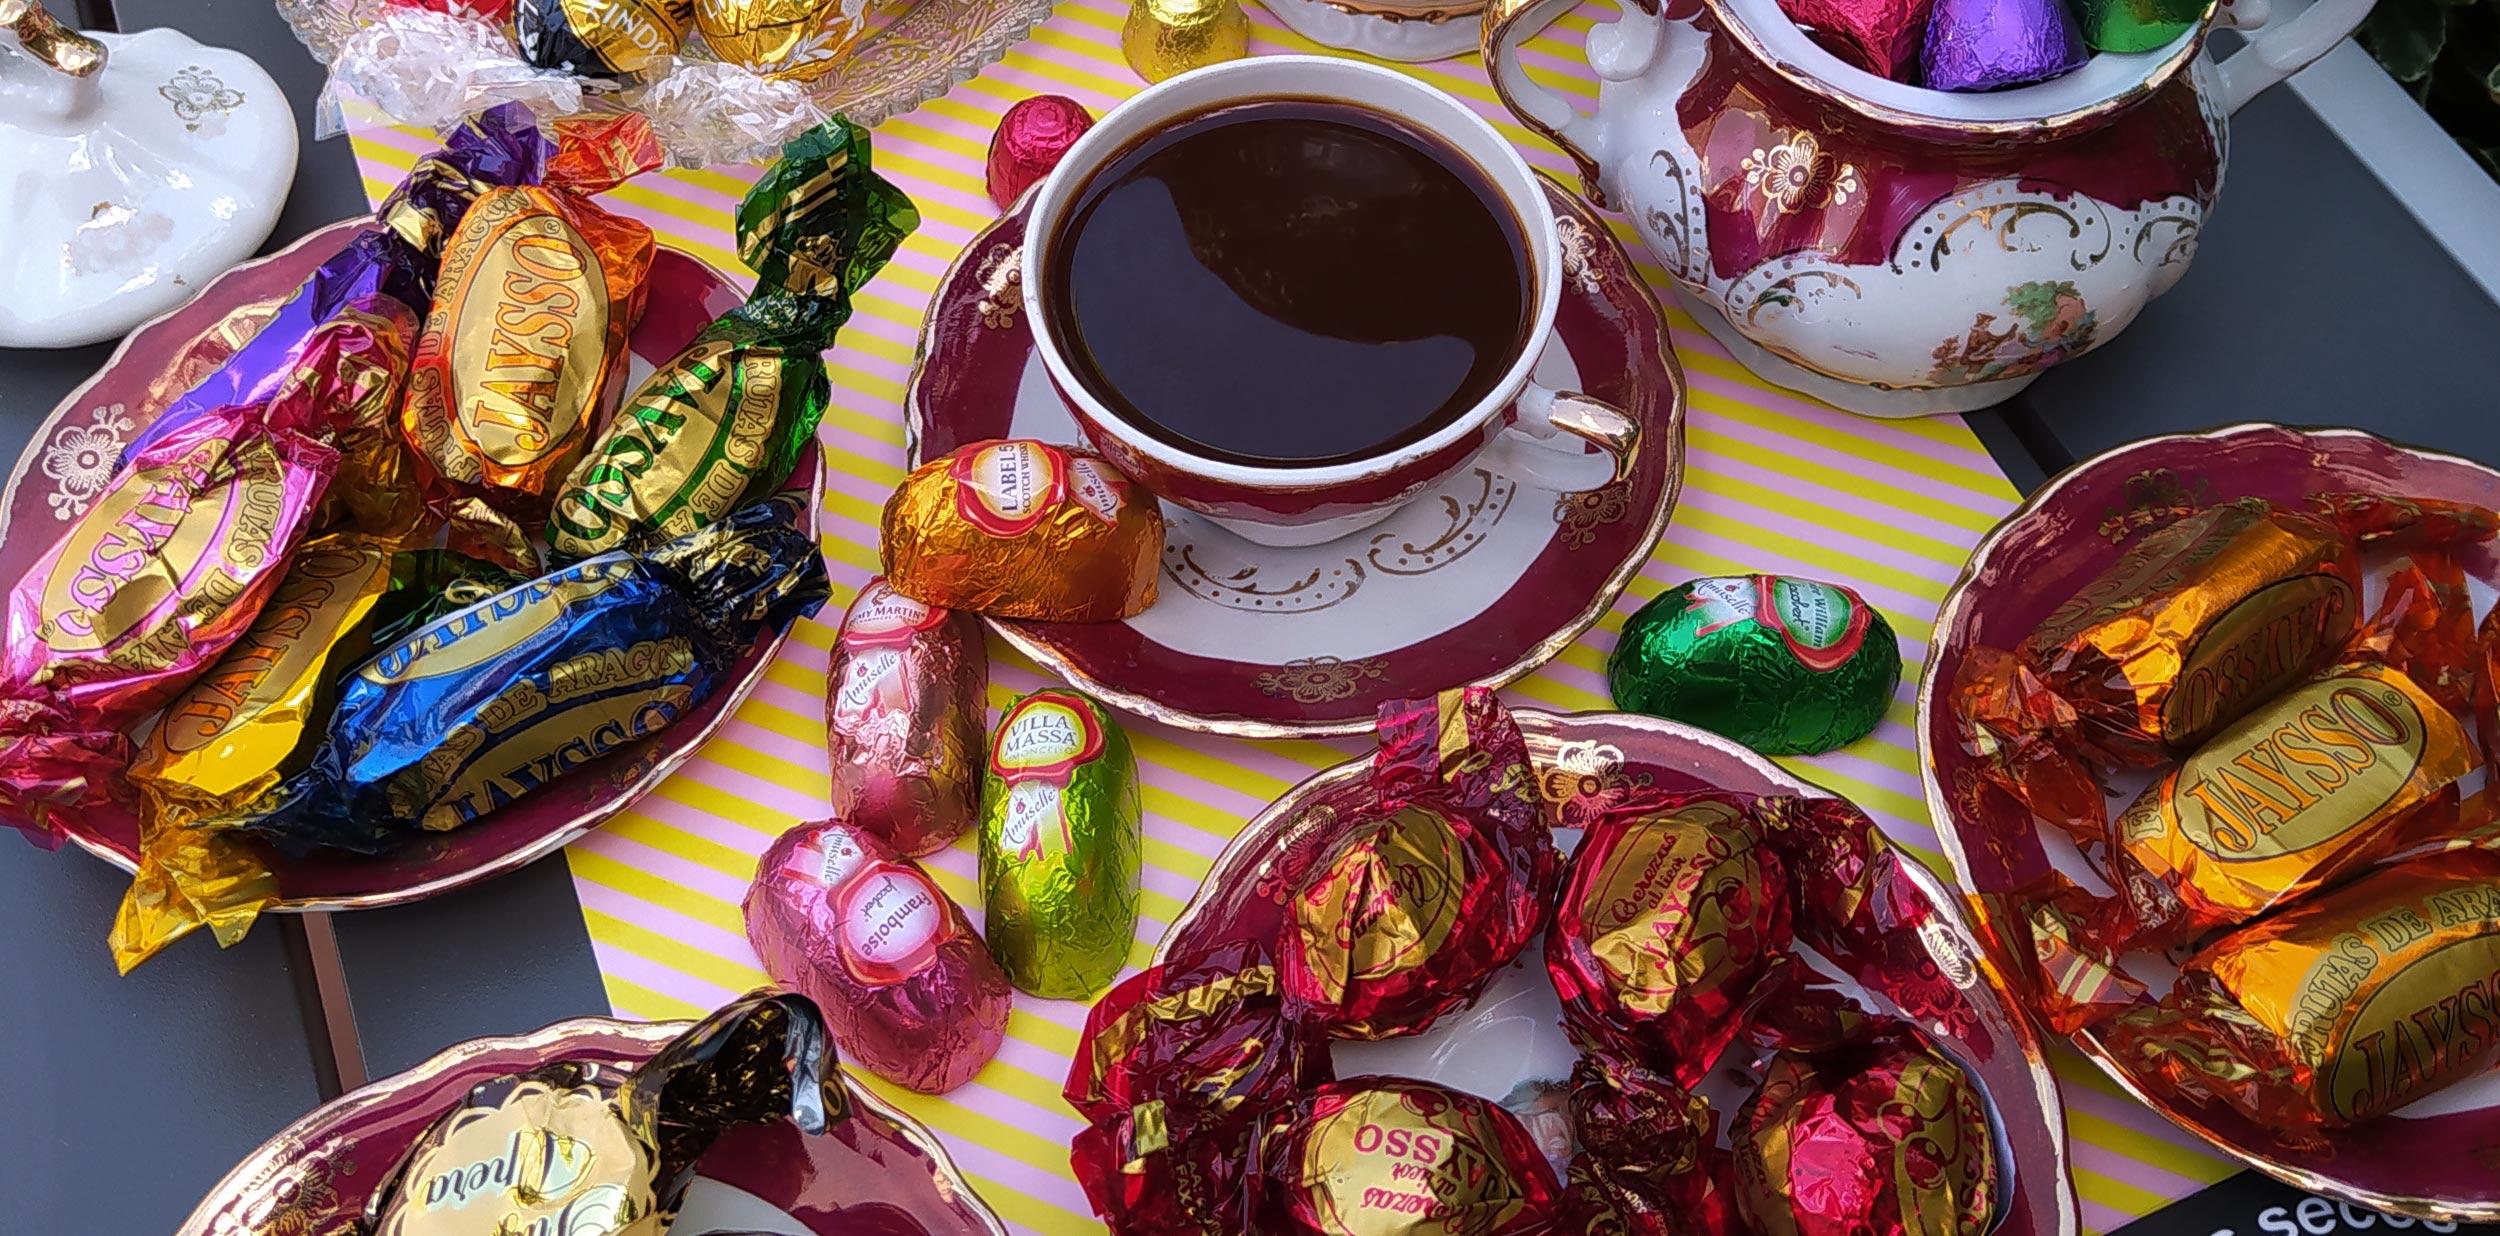 frutos secos herranz madrid dulces